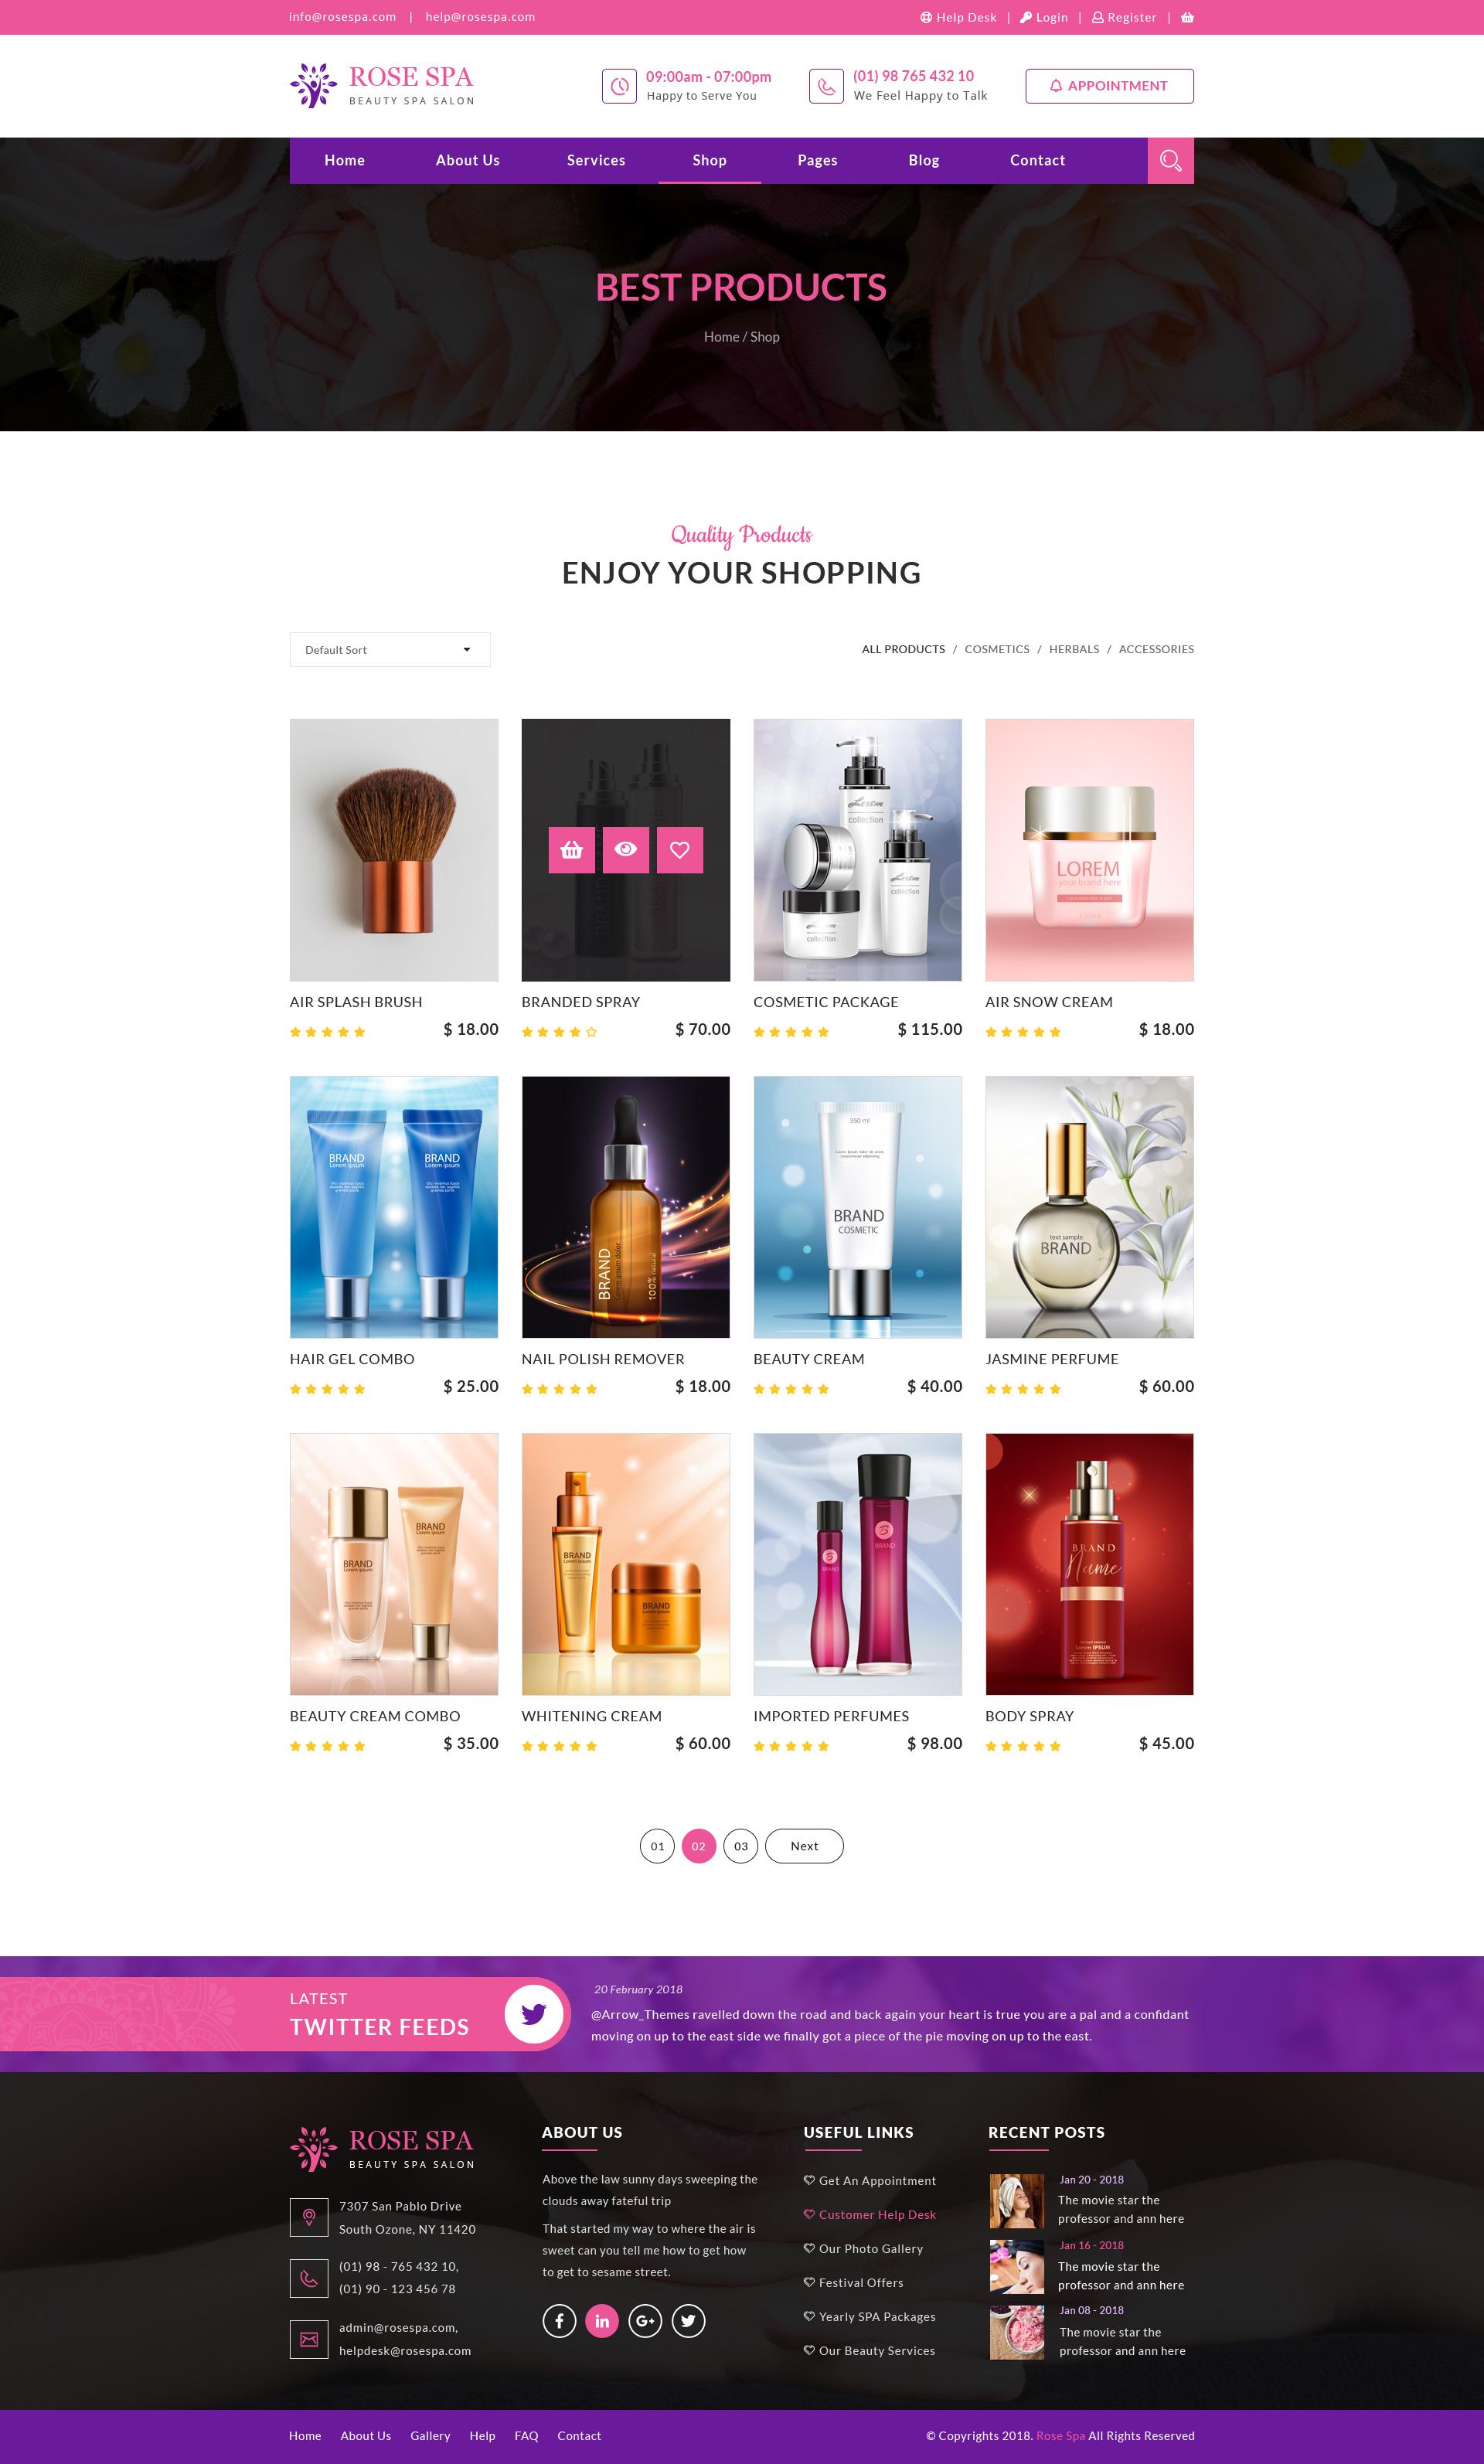 Rose SPA - Beauty SPA Salon PSD Web Template by arrow_themes ...